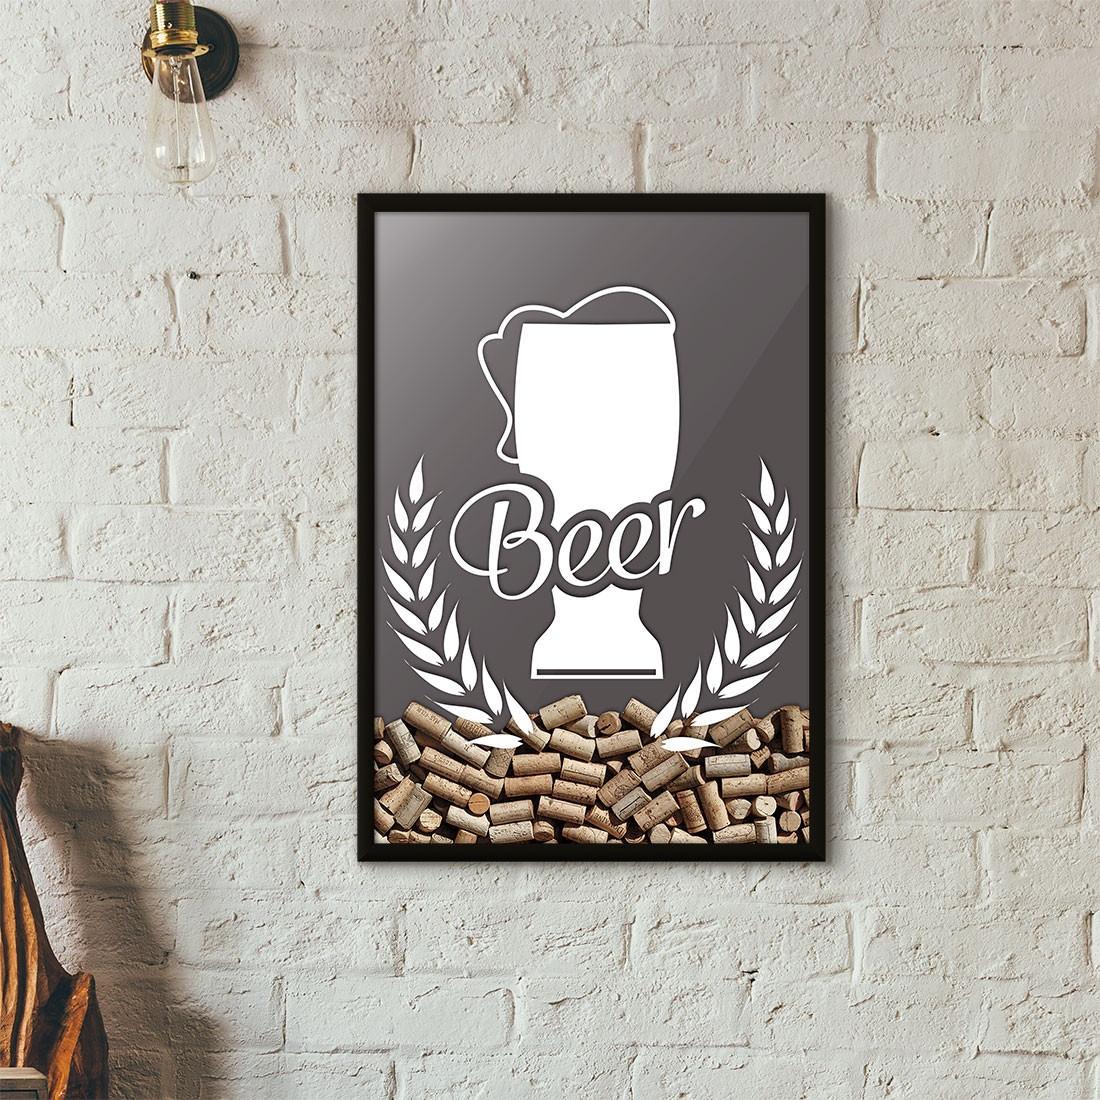 Quadro Porta Tampinhas de Cerveja - Tulipa Beer - (Moldura Preta)